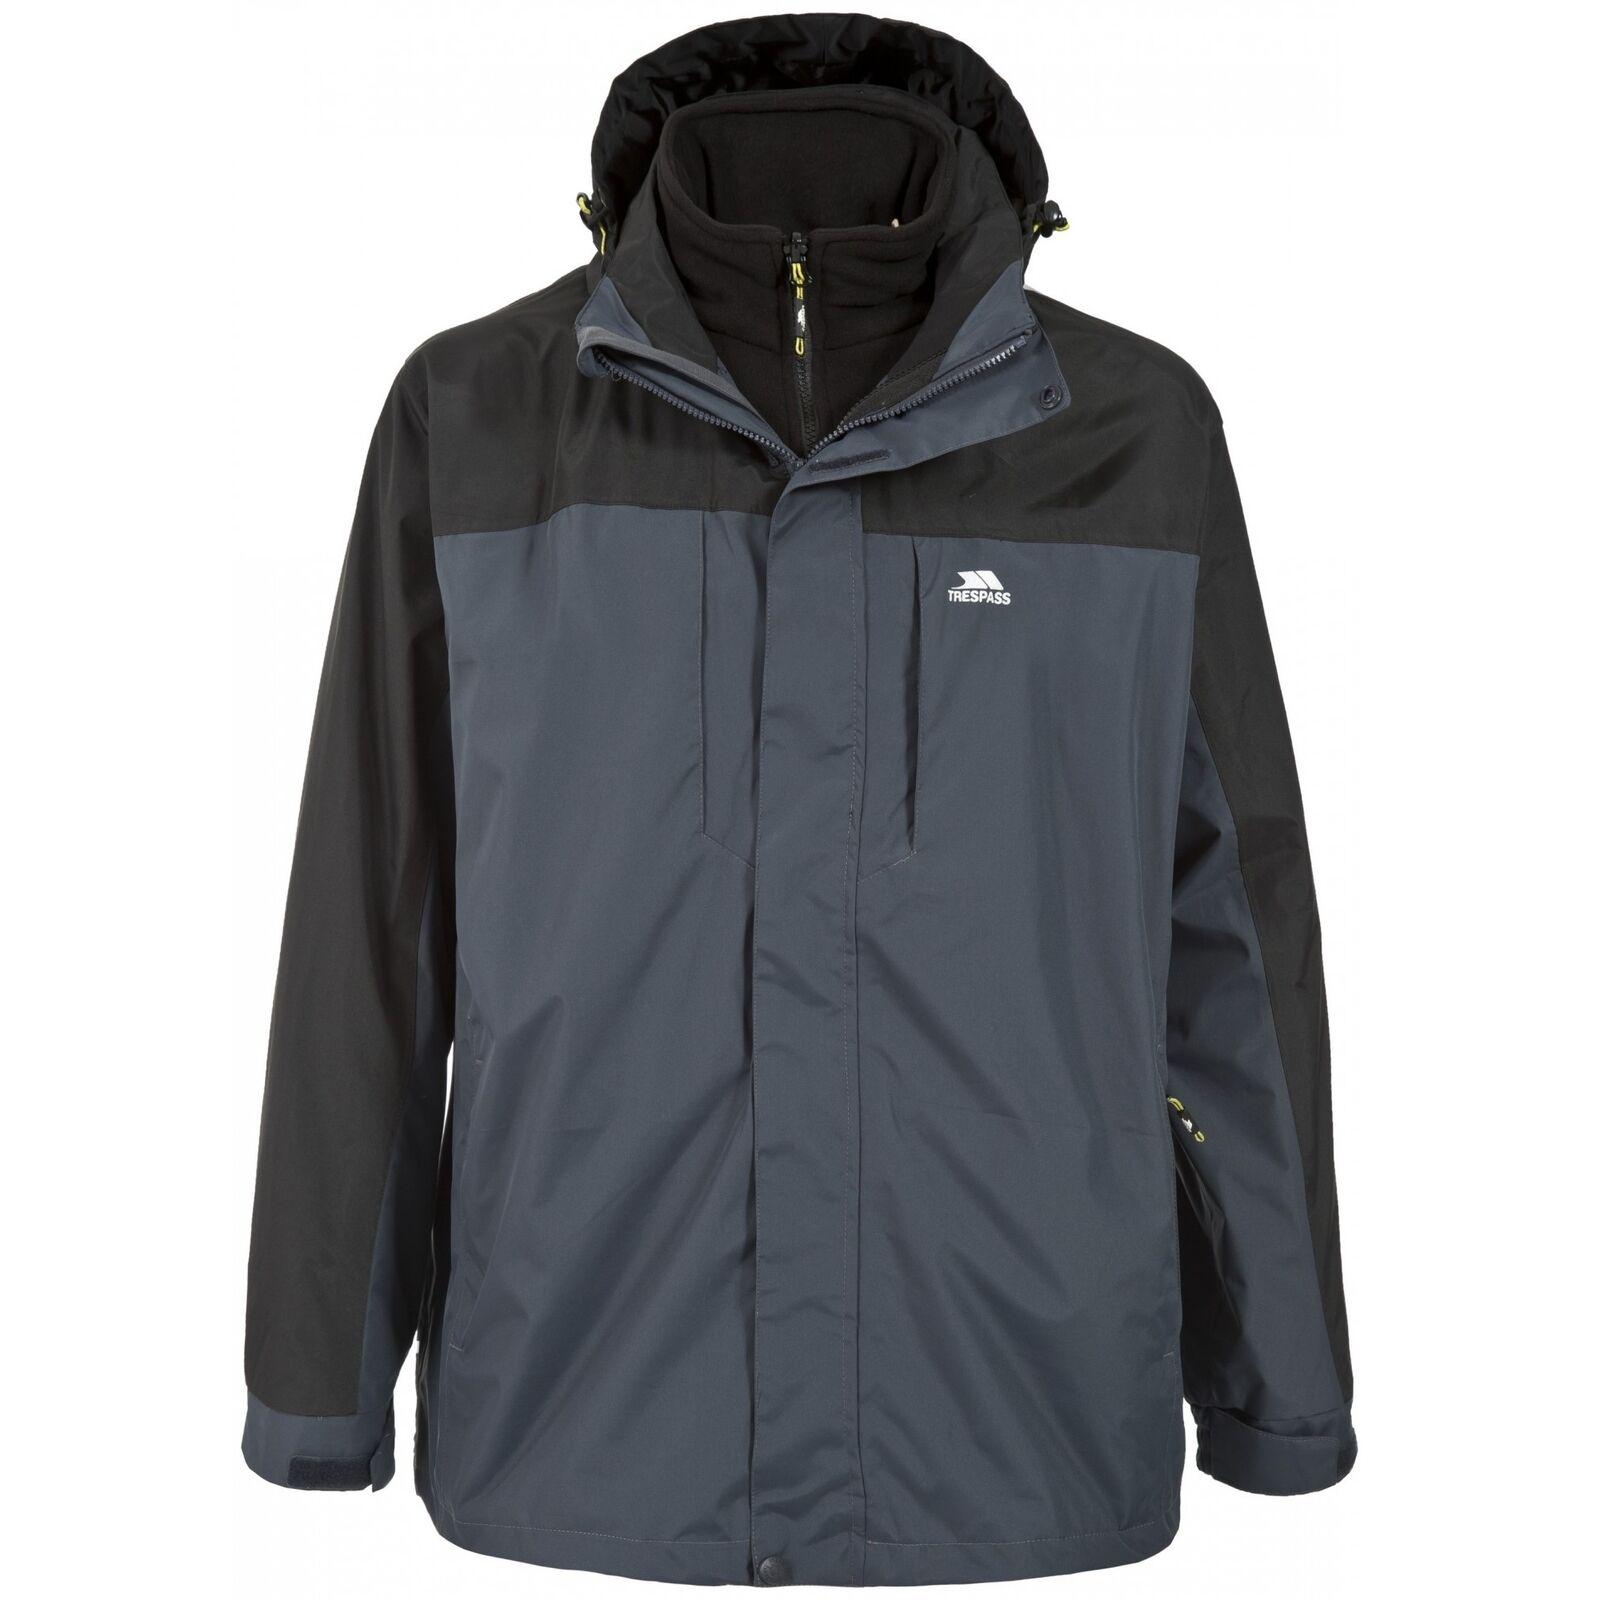 TP1301 Trespass Mens Faris Full Zip 3 In 1 Jacket 2 Colours 7 Sizes XXS-XXL